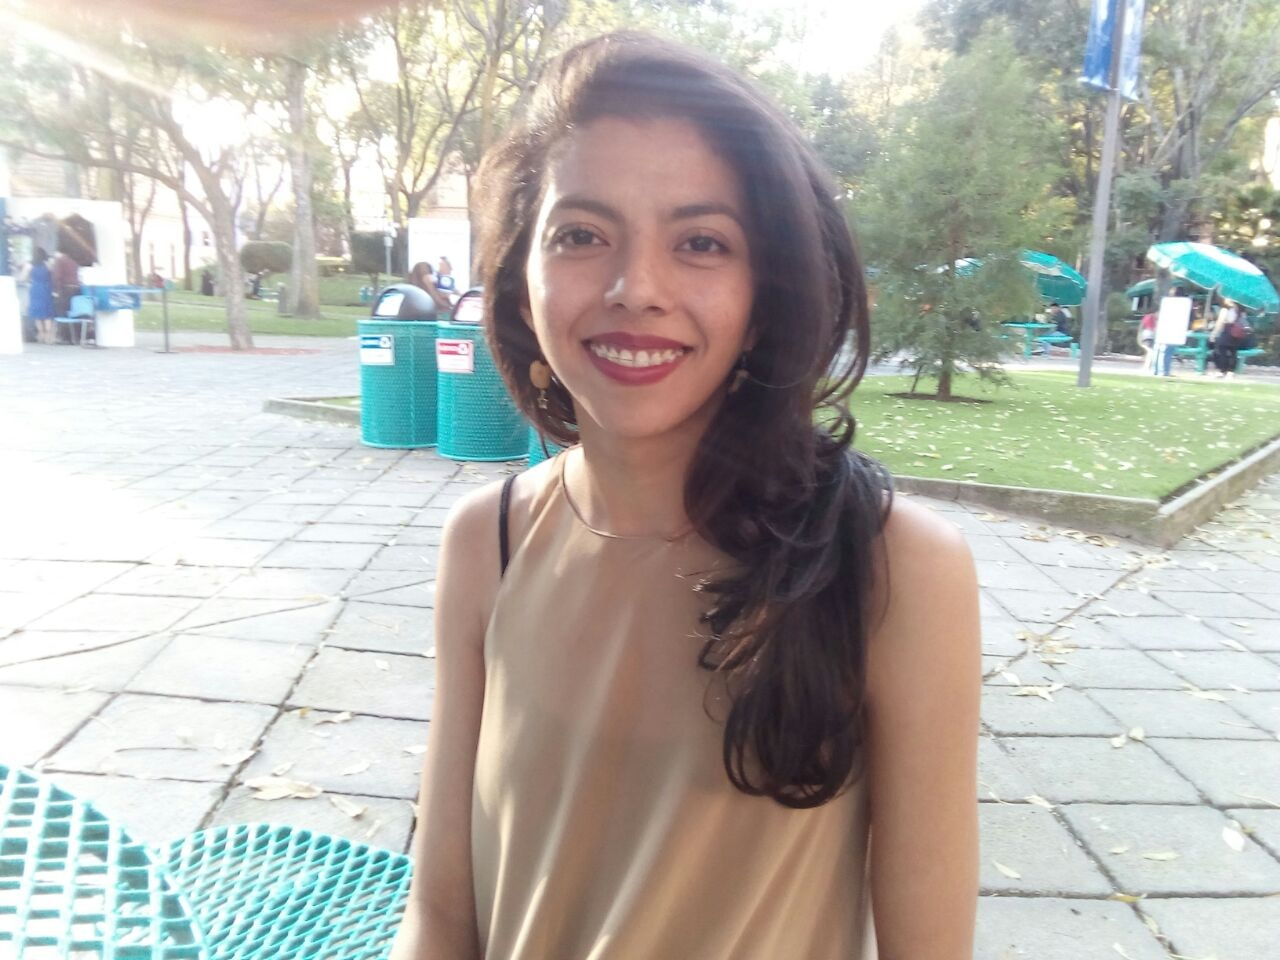 Go to Meily Villaseñor's profile